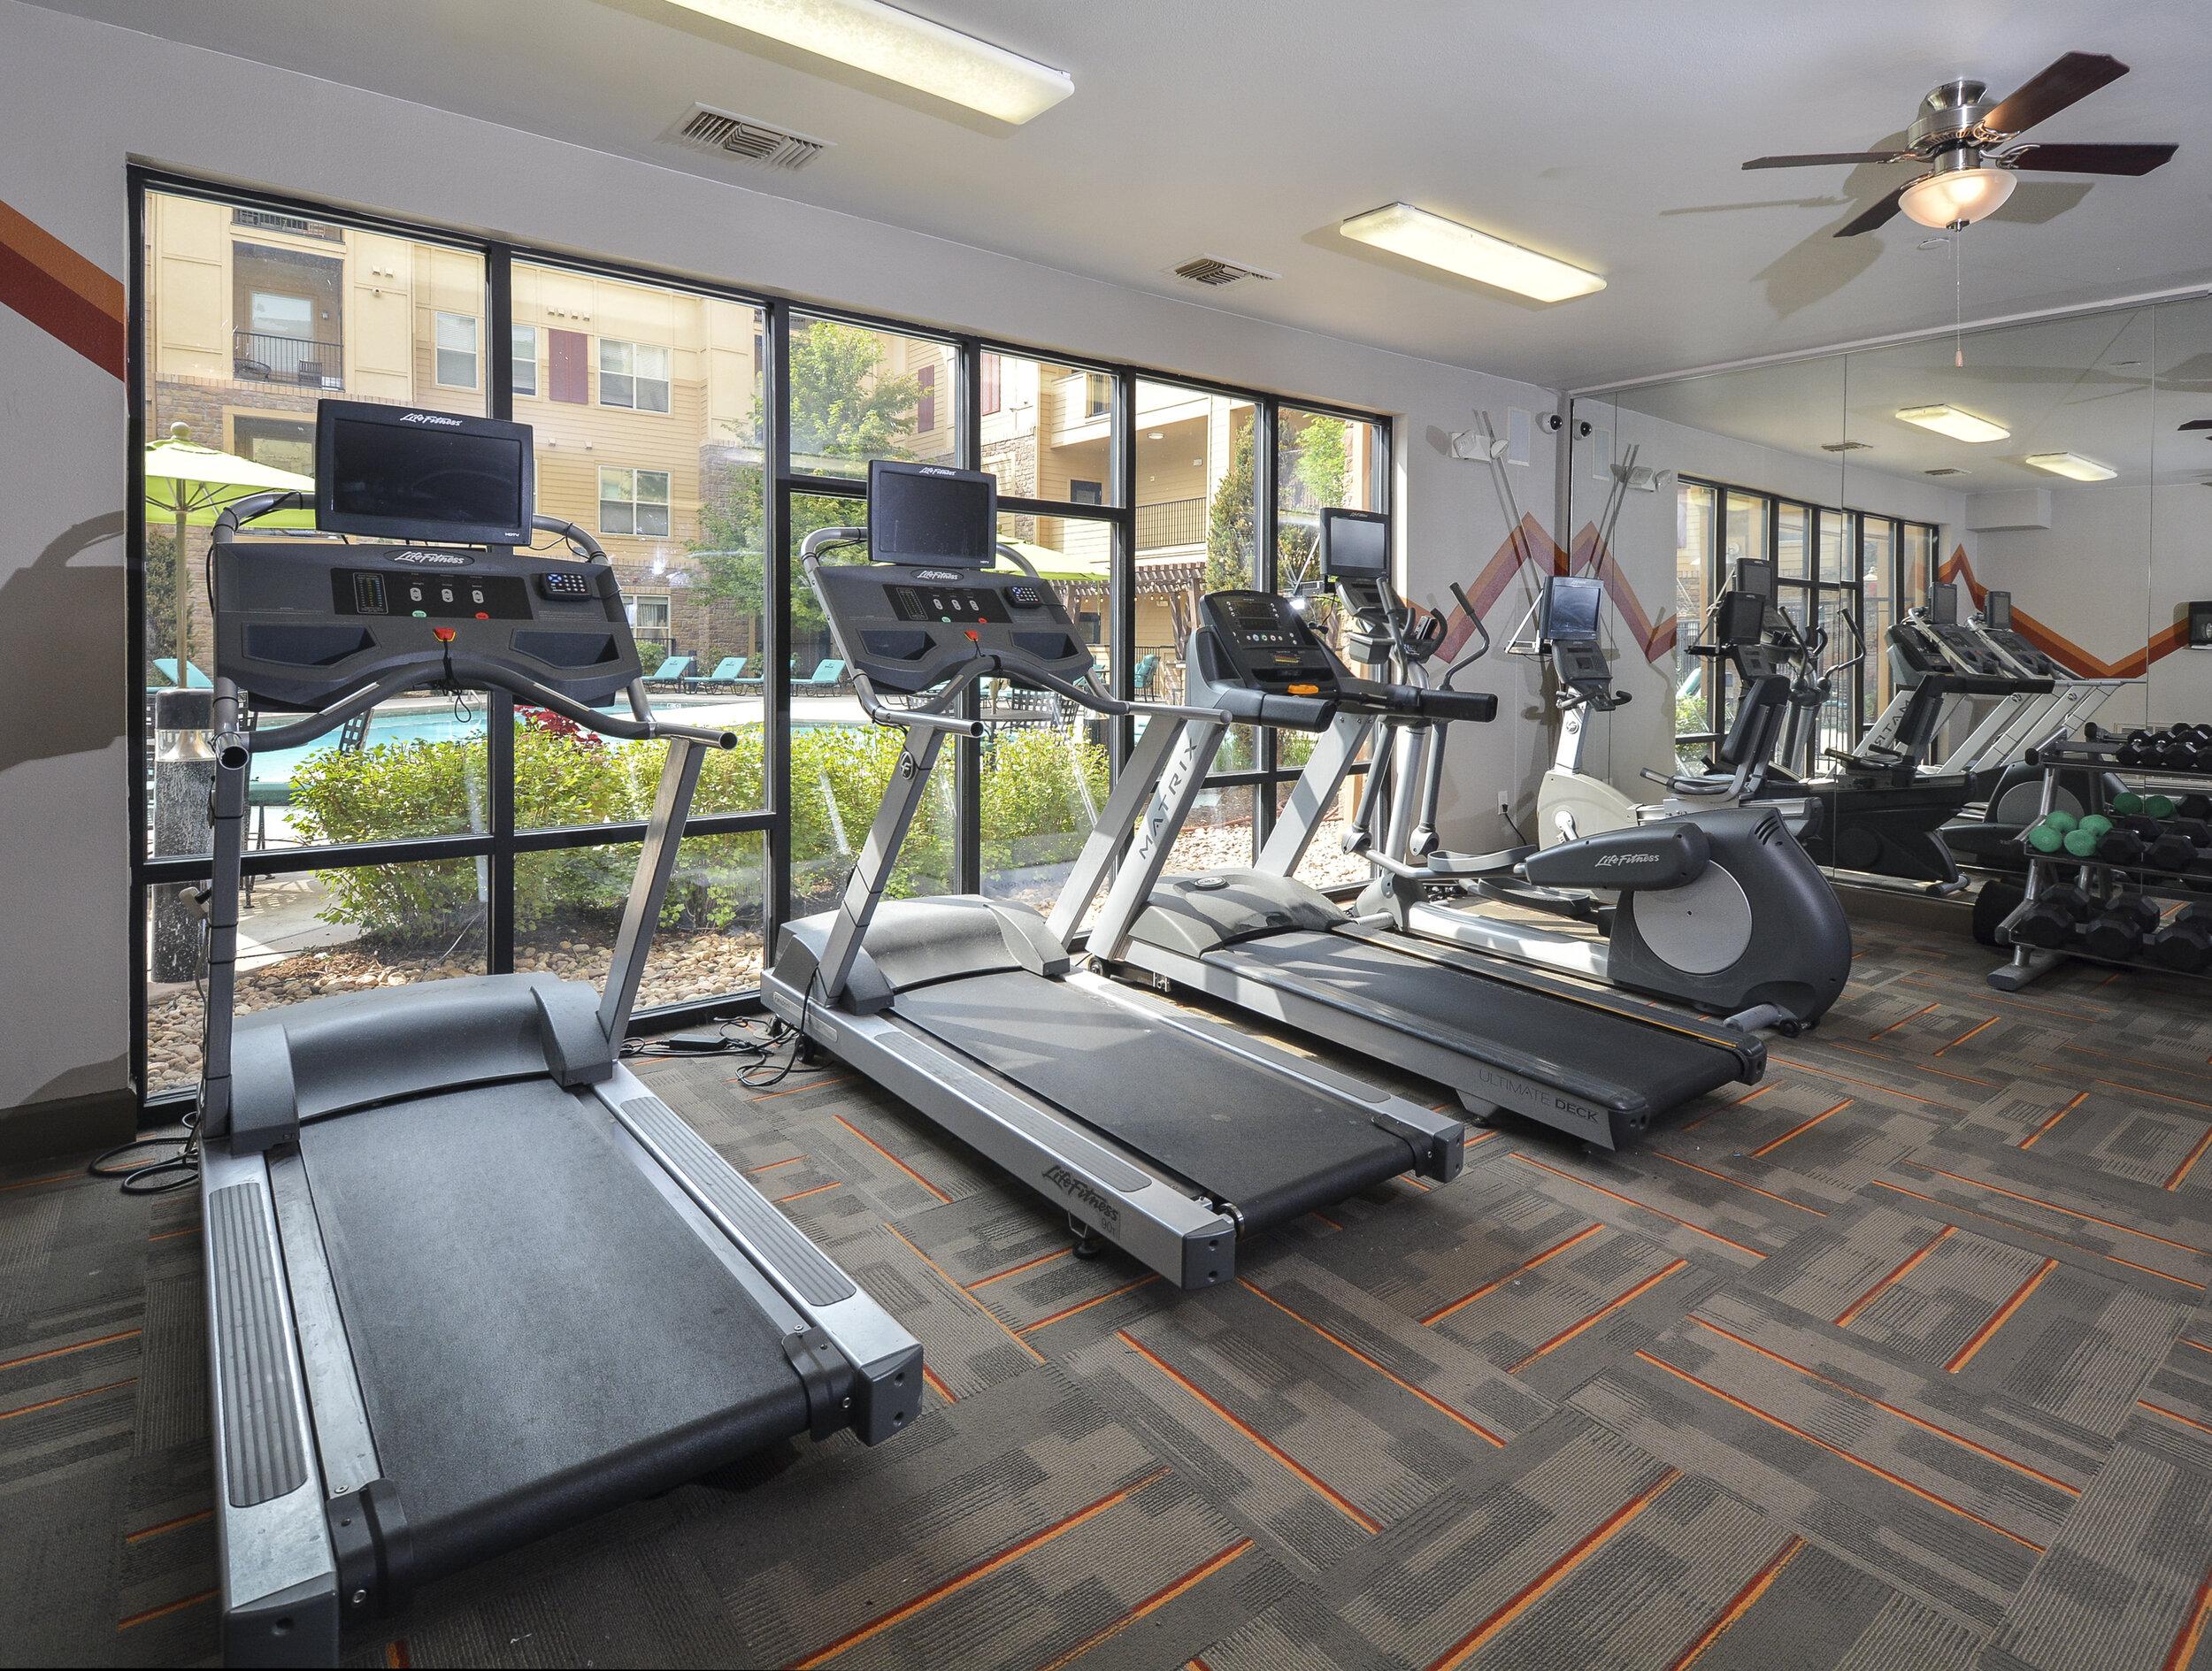 15 24-Hour State-of-the-Art Fitness Center.jpg